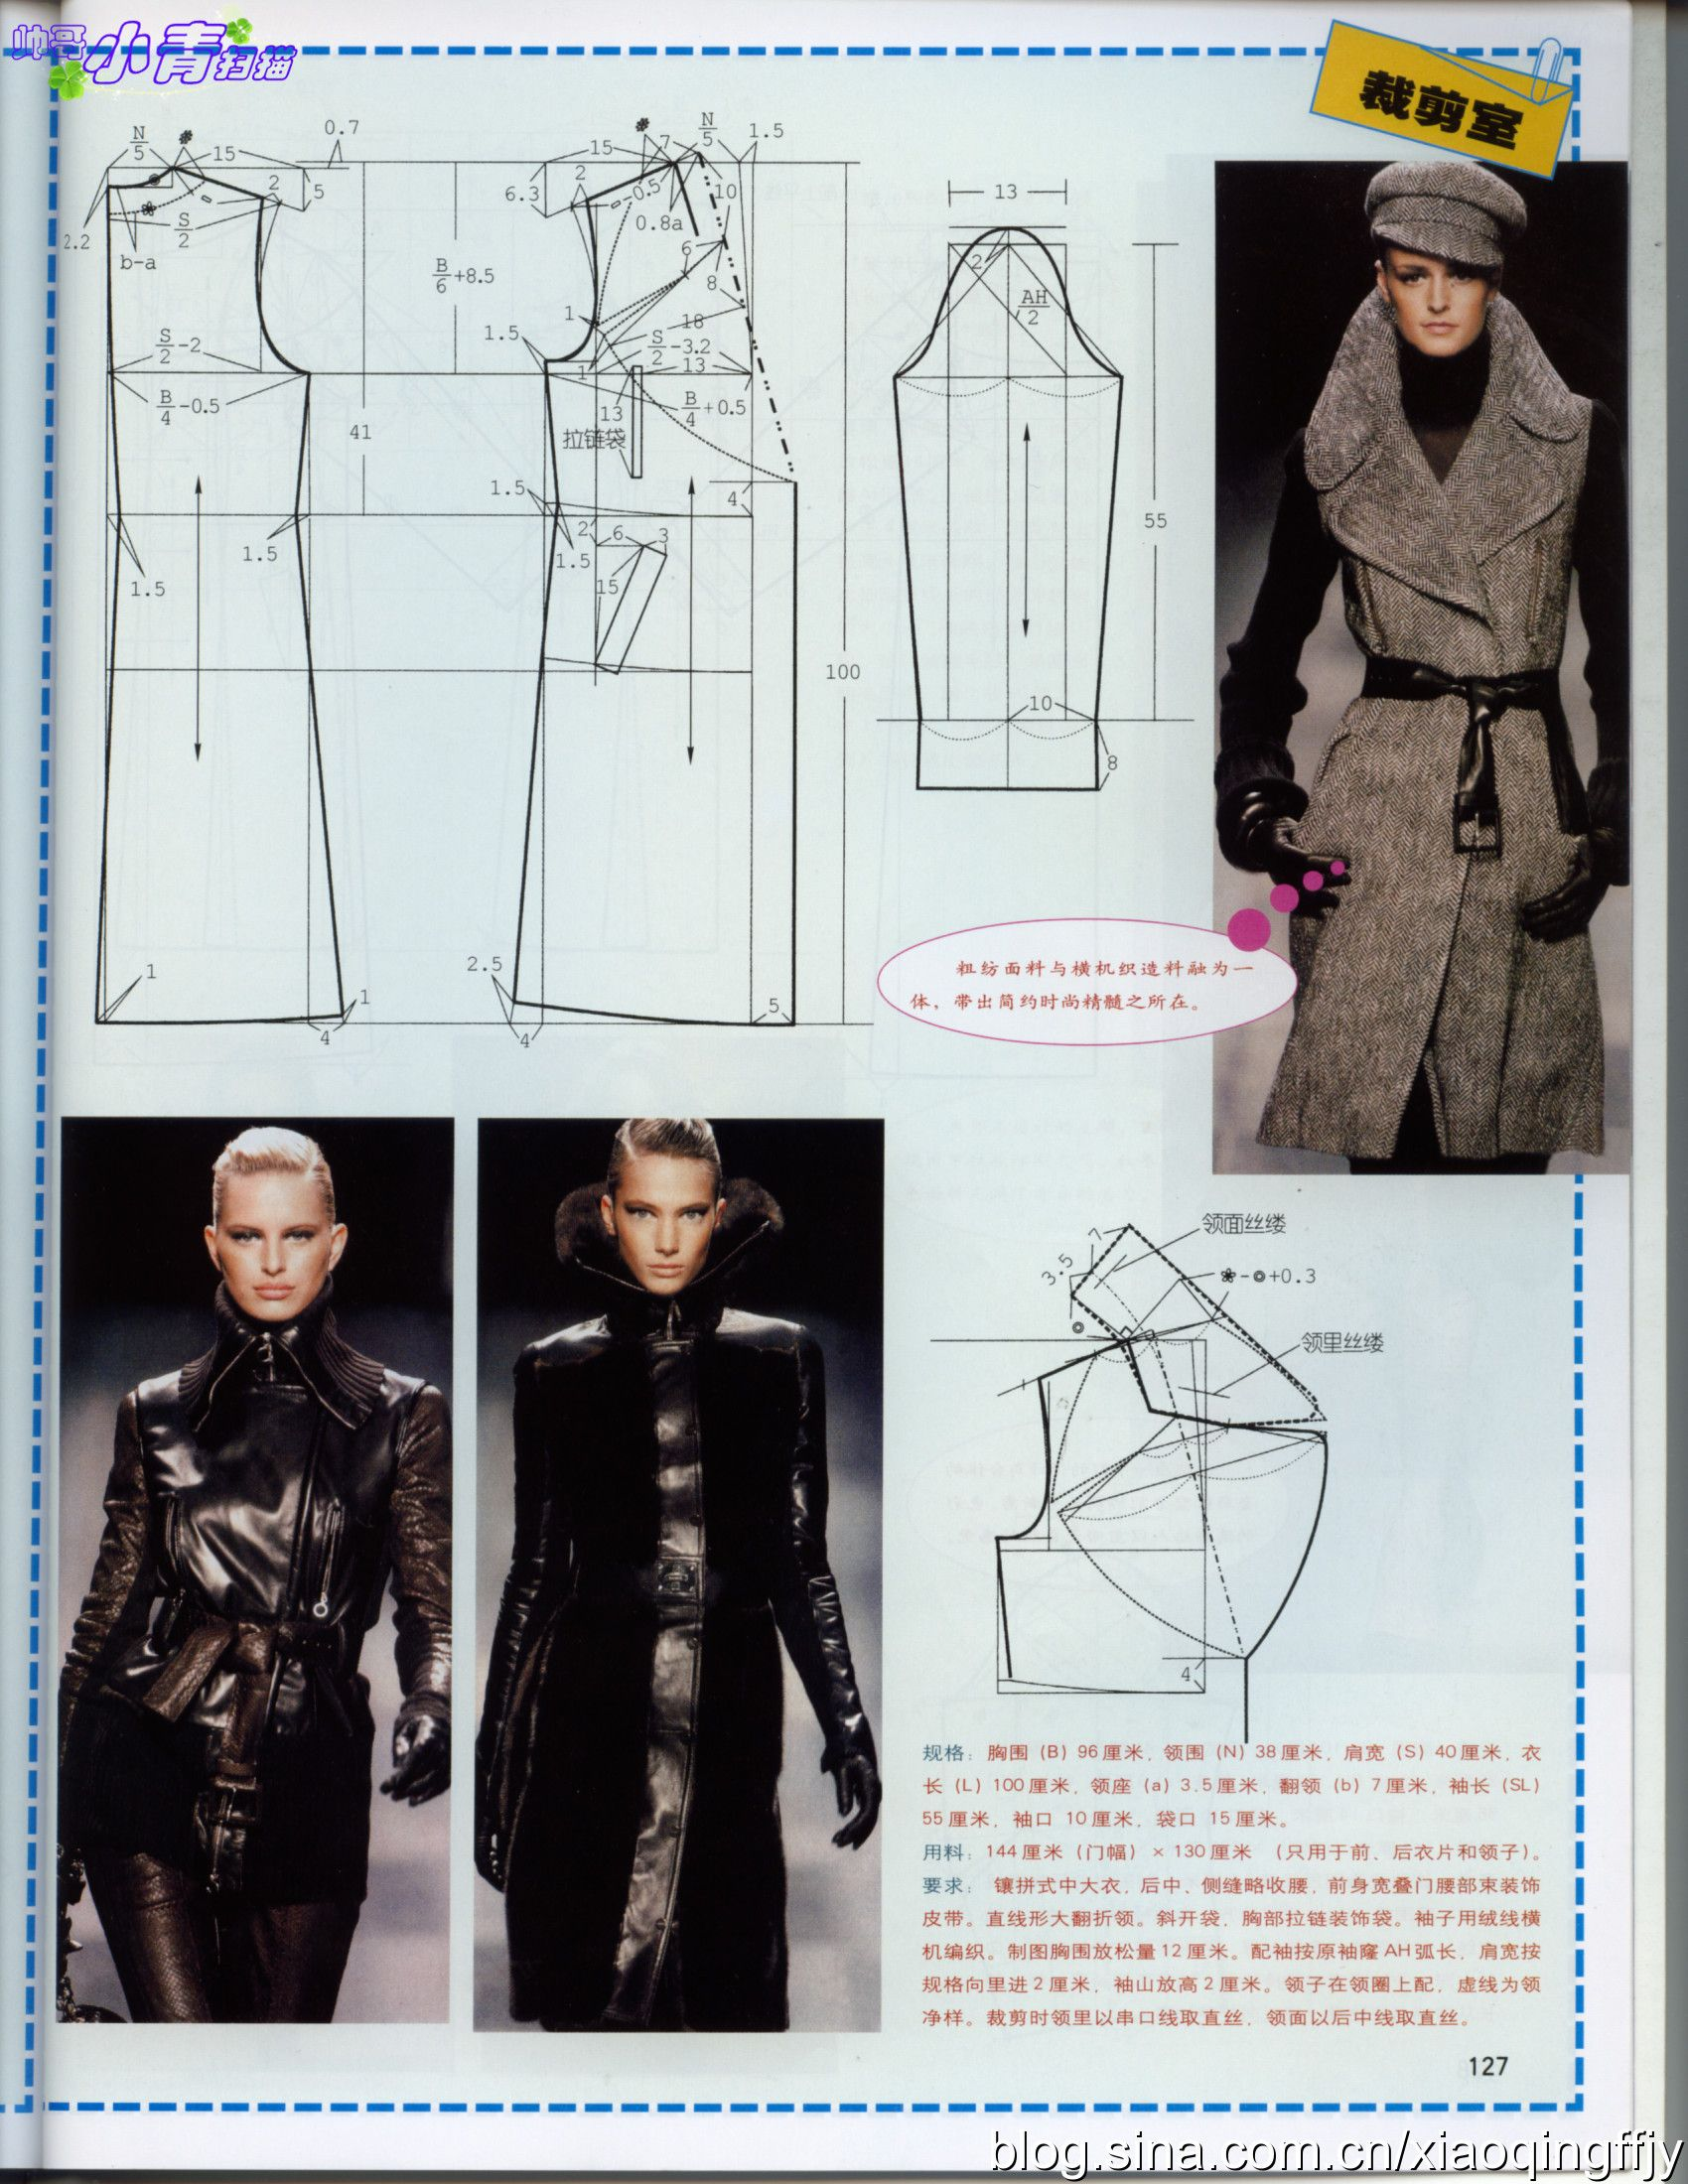 Shanghai fashion 2003 | Mis moldes | Pinterest | Patrones, Molde y ...